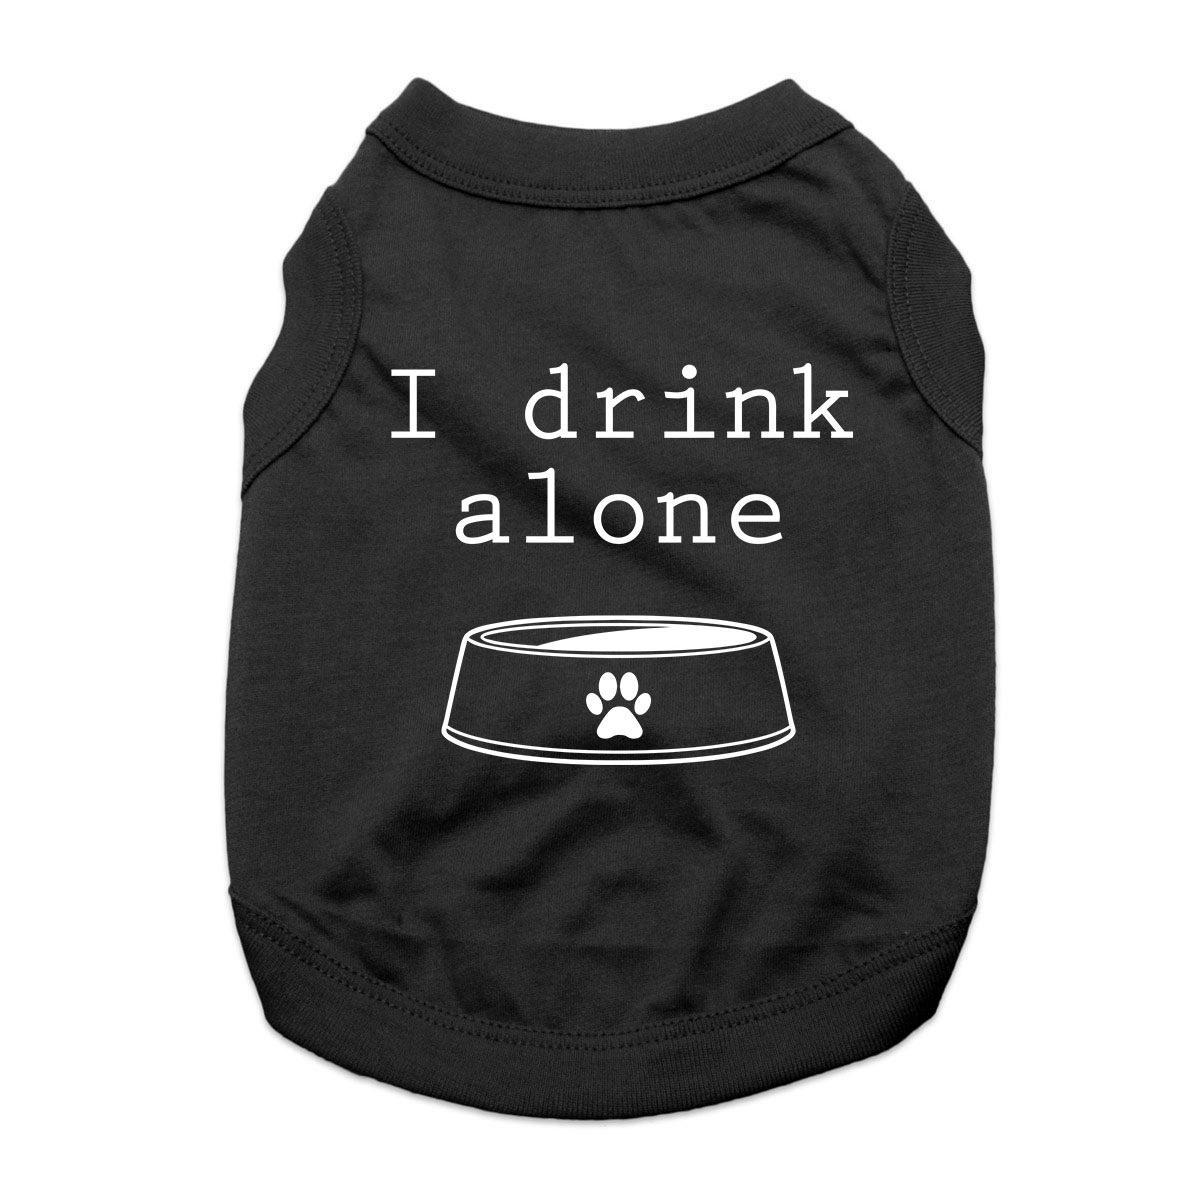 I Drink Alone Dog Shirt - Black